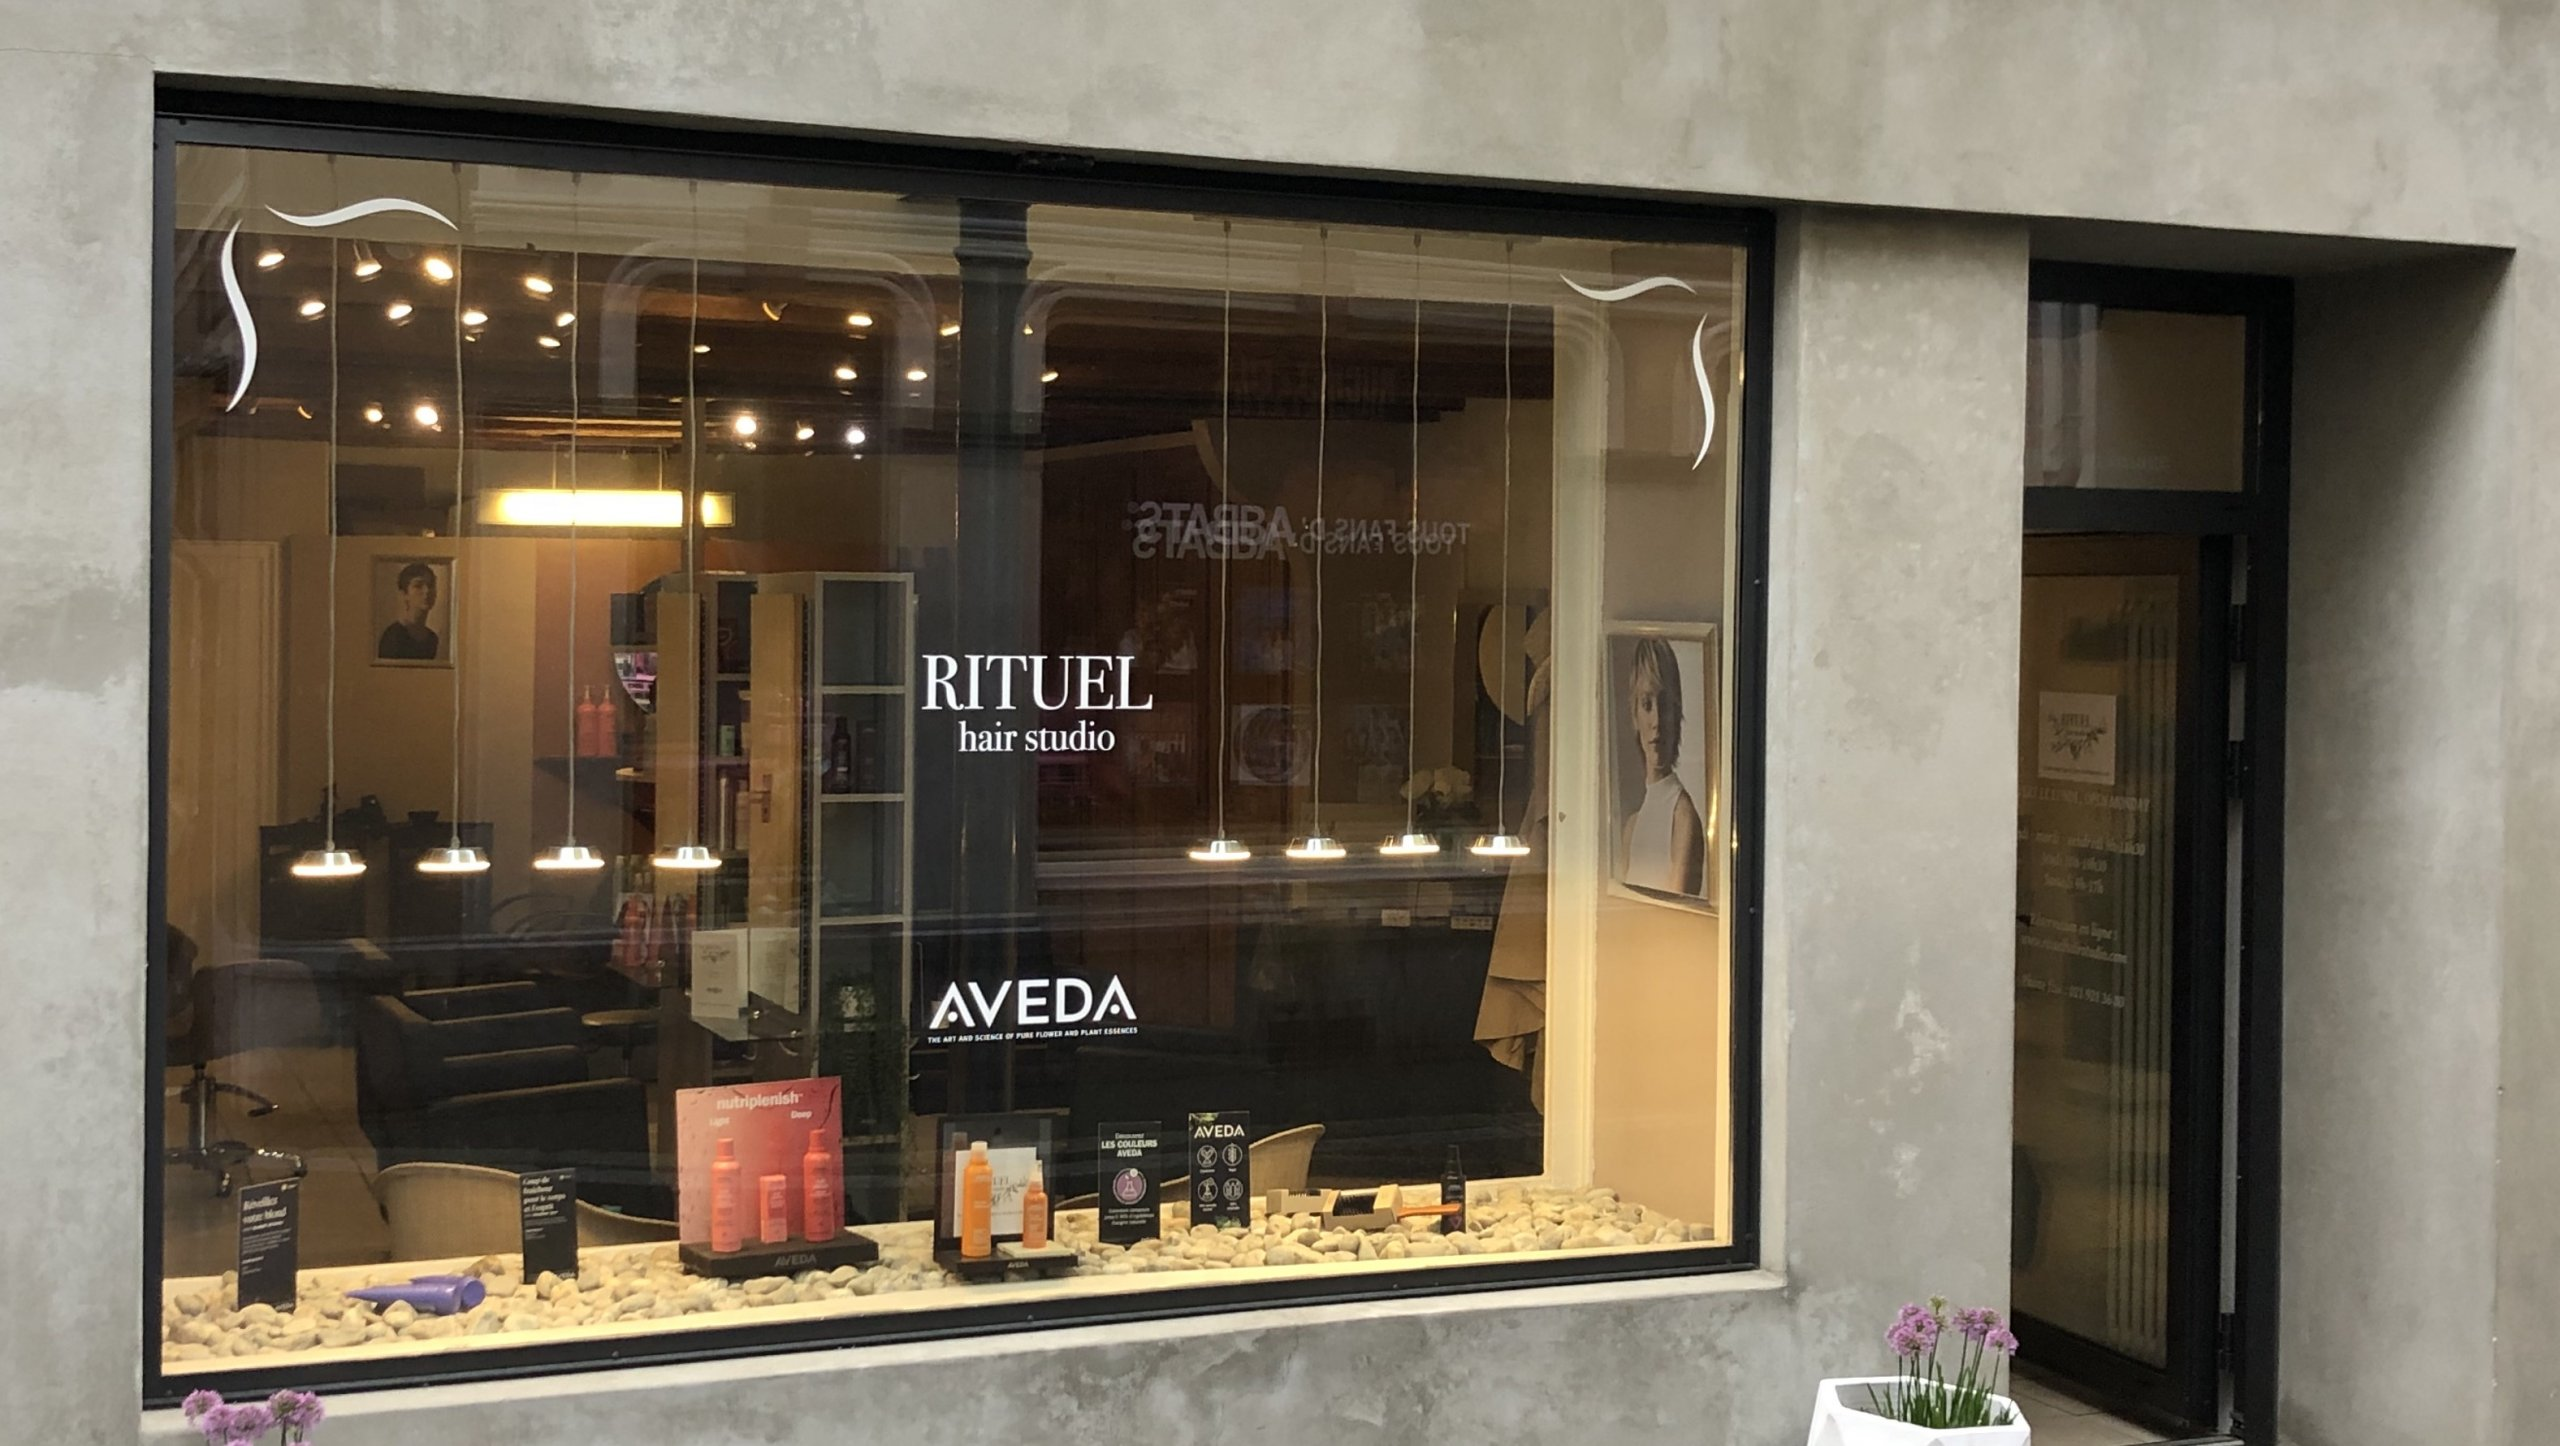 Rituel Hair Studio Aveda vevey